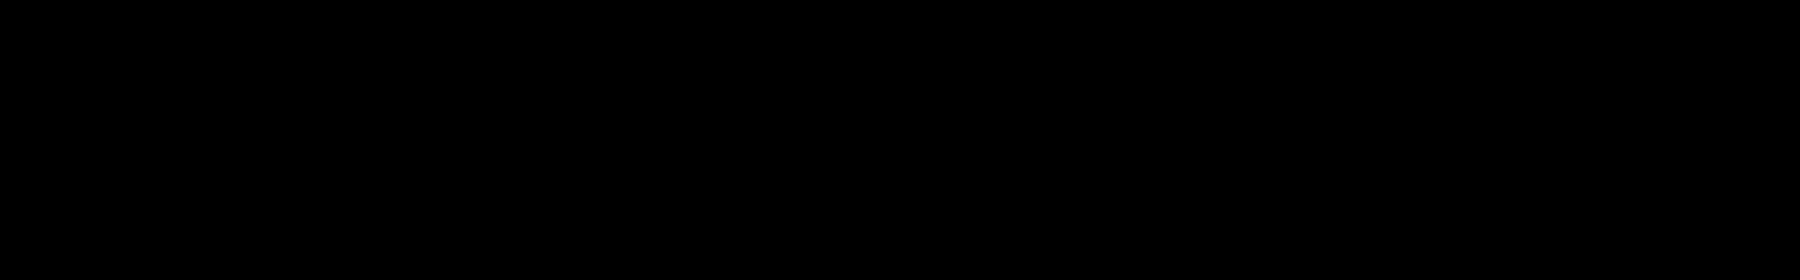 Hans Driller audio waveform